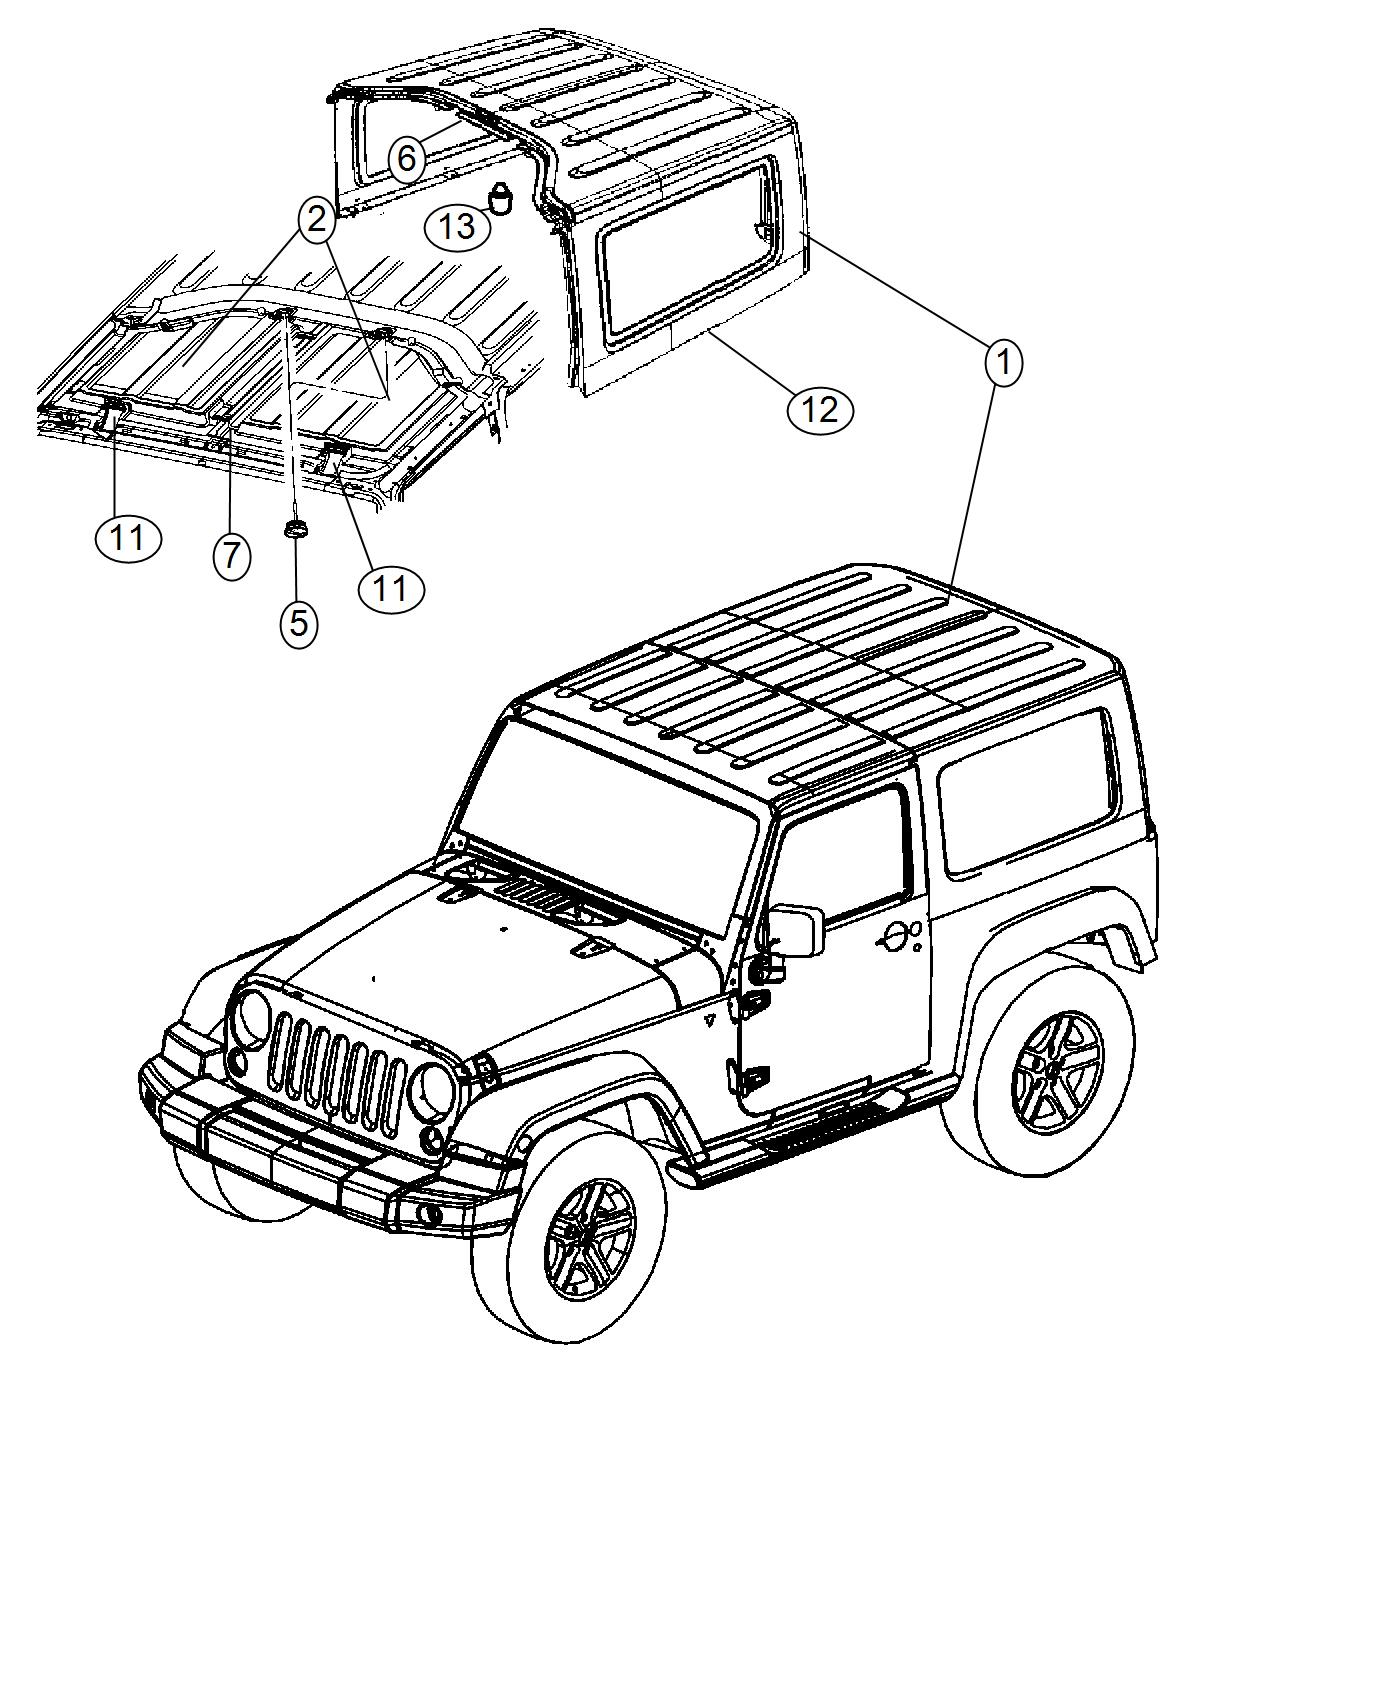 2017 Jeep Wrangler Hardtop. [black 3-piece hard top